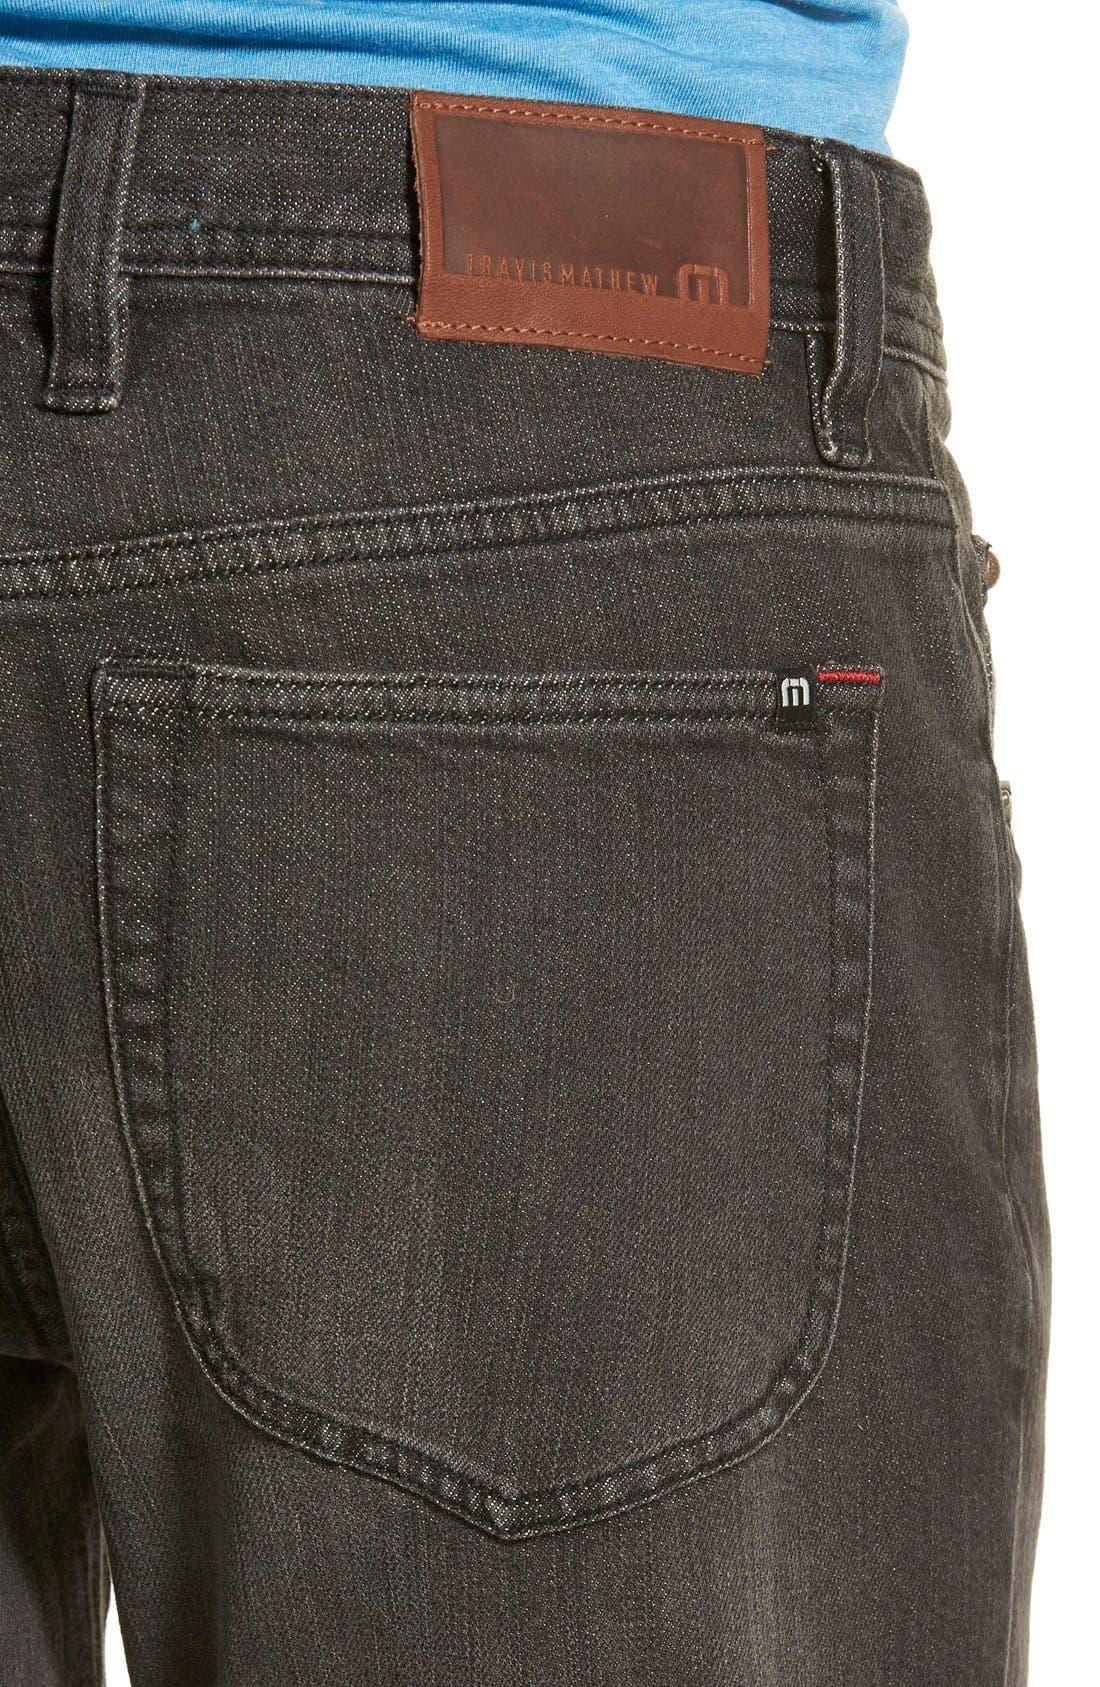 'Duke' Relaxed Fit Jeans,                             Alternate thumbnail 4, color,                             002